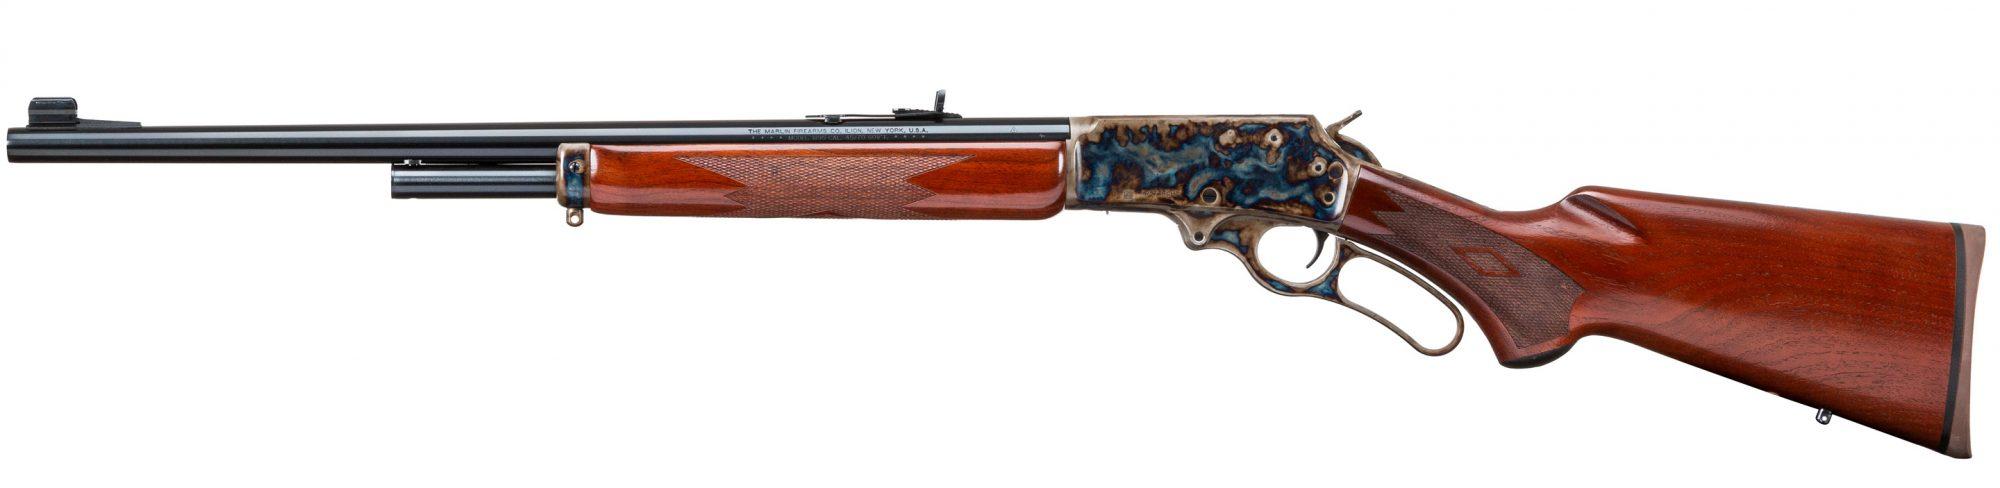 6562 Turnbull Marlin 1895 MR17784H